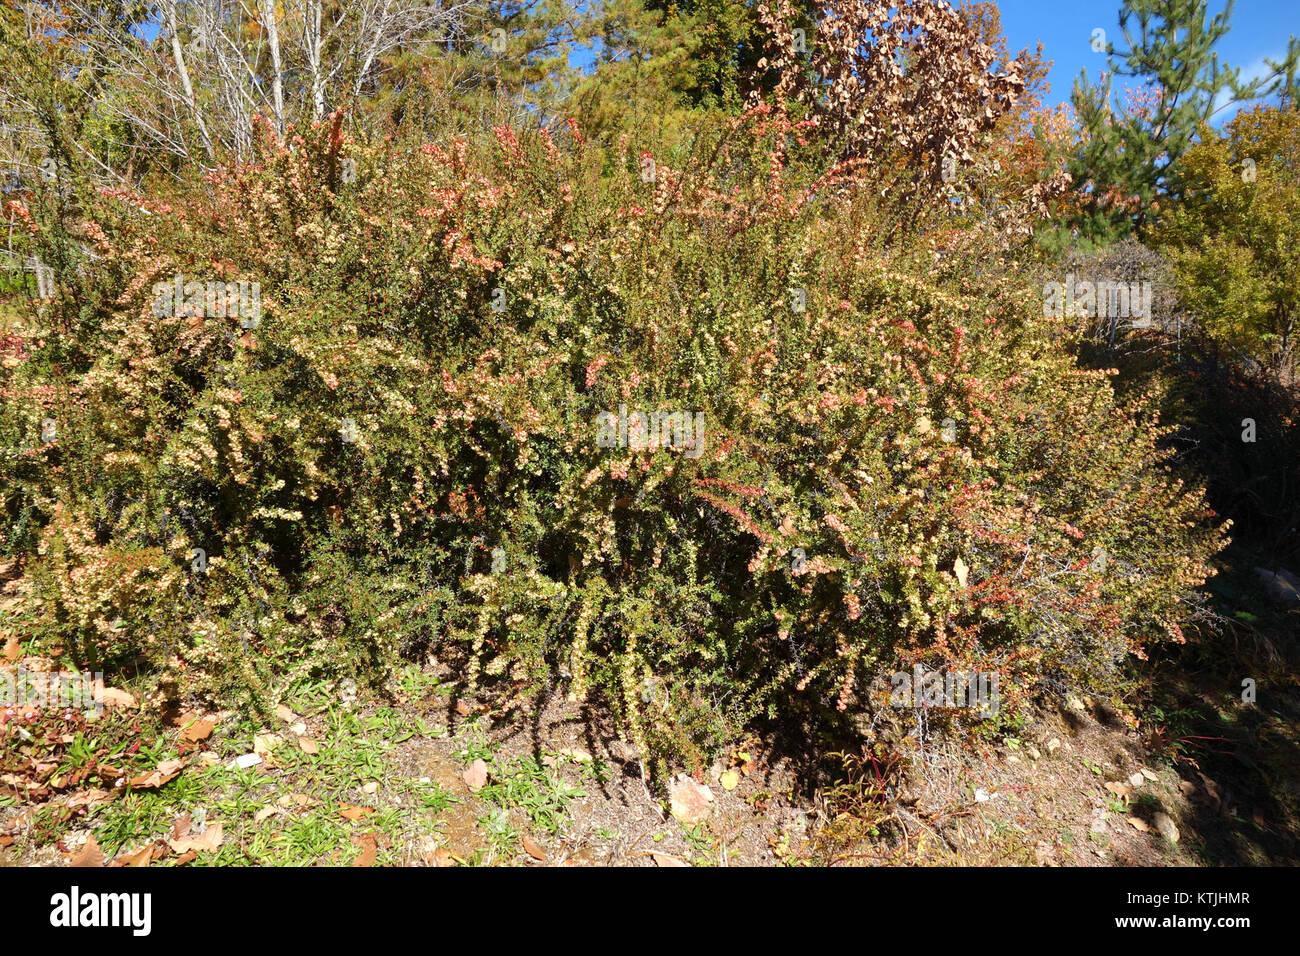 berberis wilsoniae quarryhill botanical garden dsc03667 - Quarryhill Botanical Garden